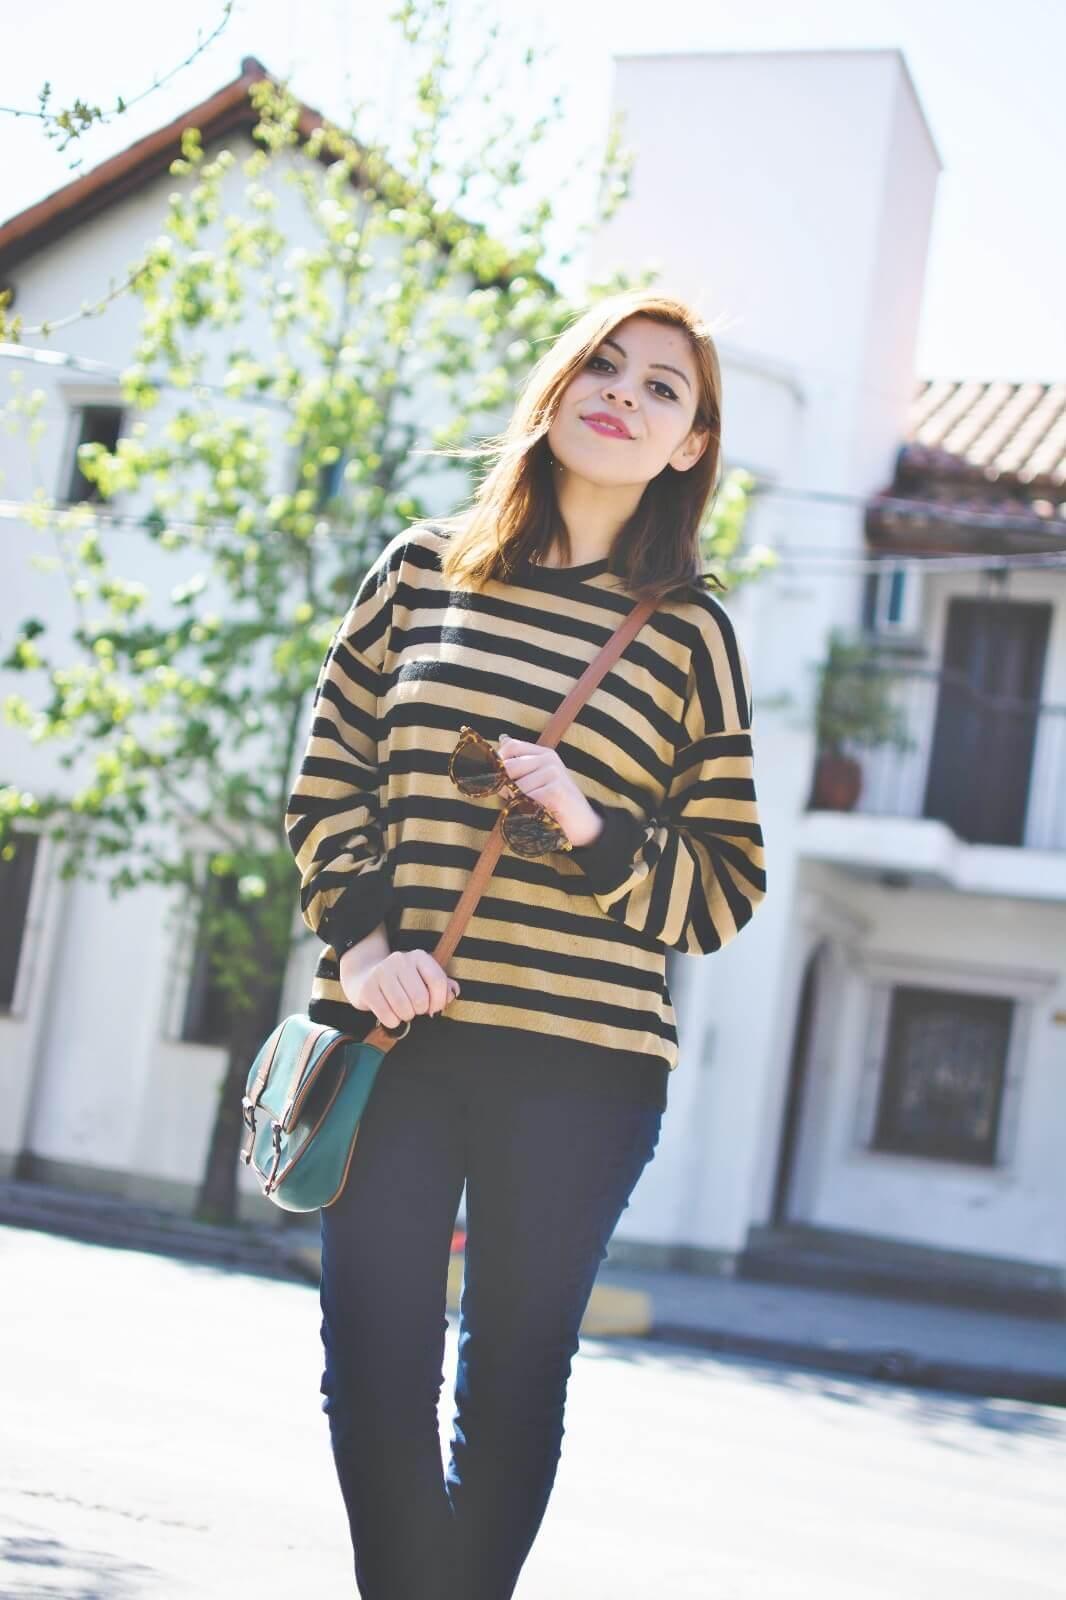 sammydress-block-heel-sandals-leopard-frame-light-brown-sammydress-sunglasses-deborah-ferrero-style-by-deb-streetstyle-salta-striped-sweater-fall2016-trends09